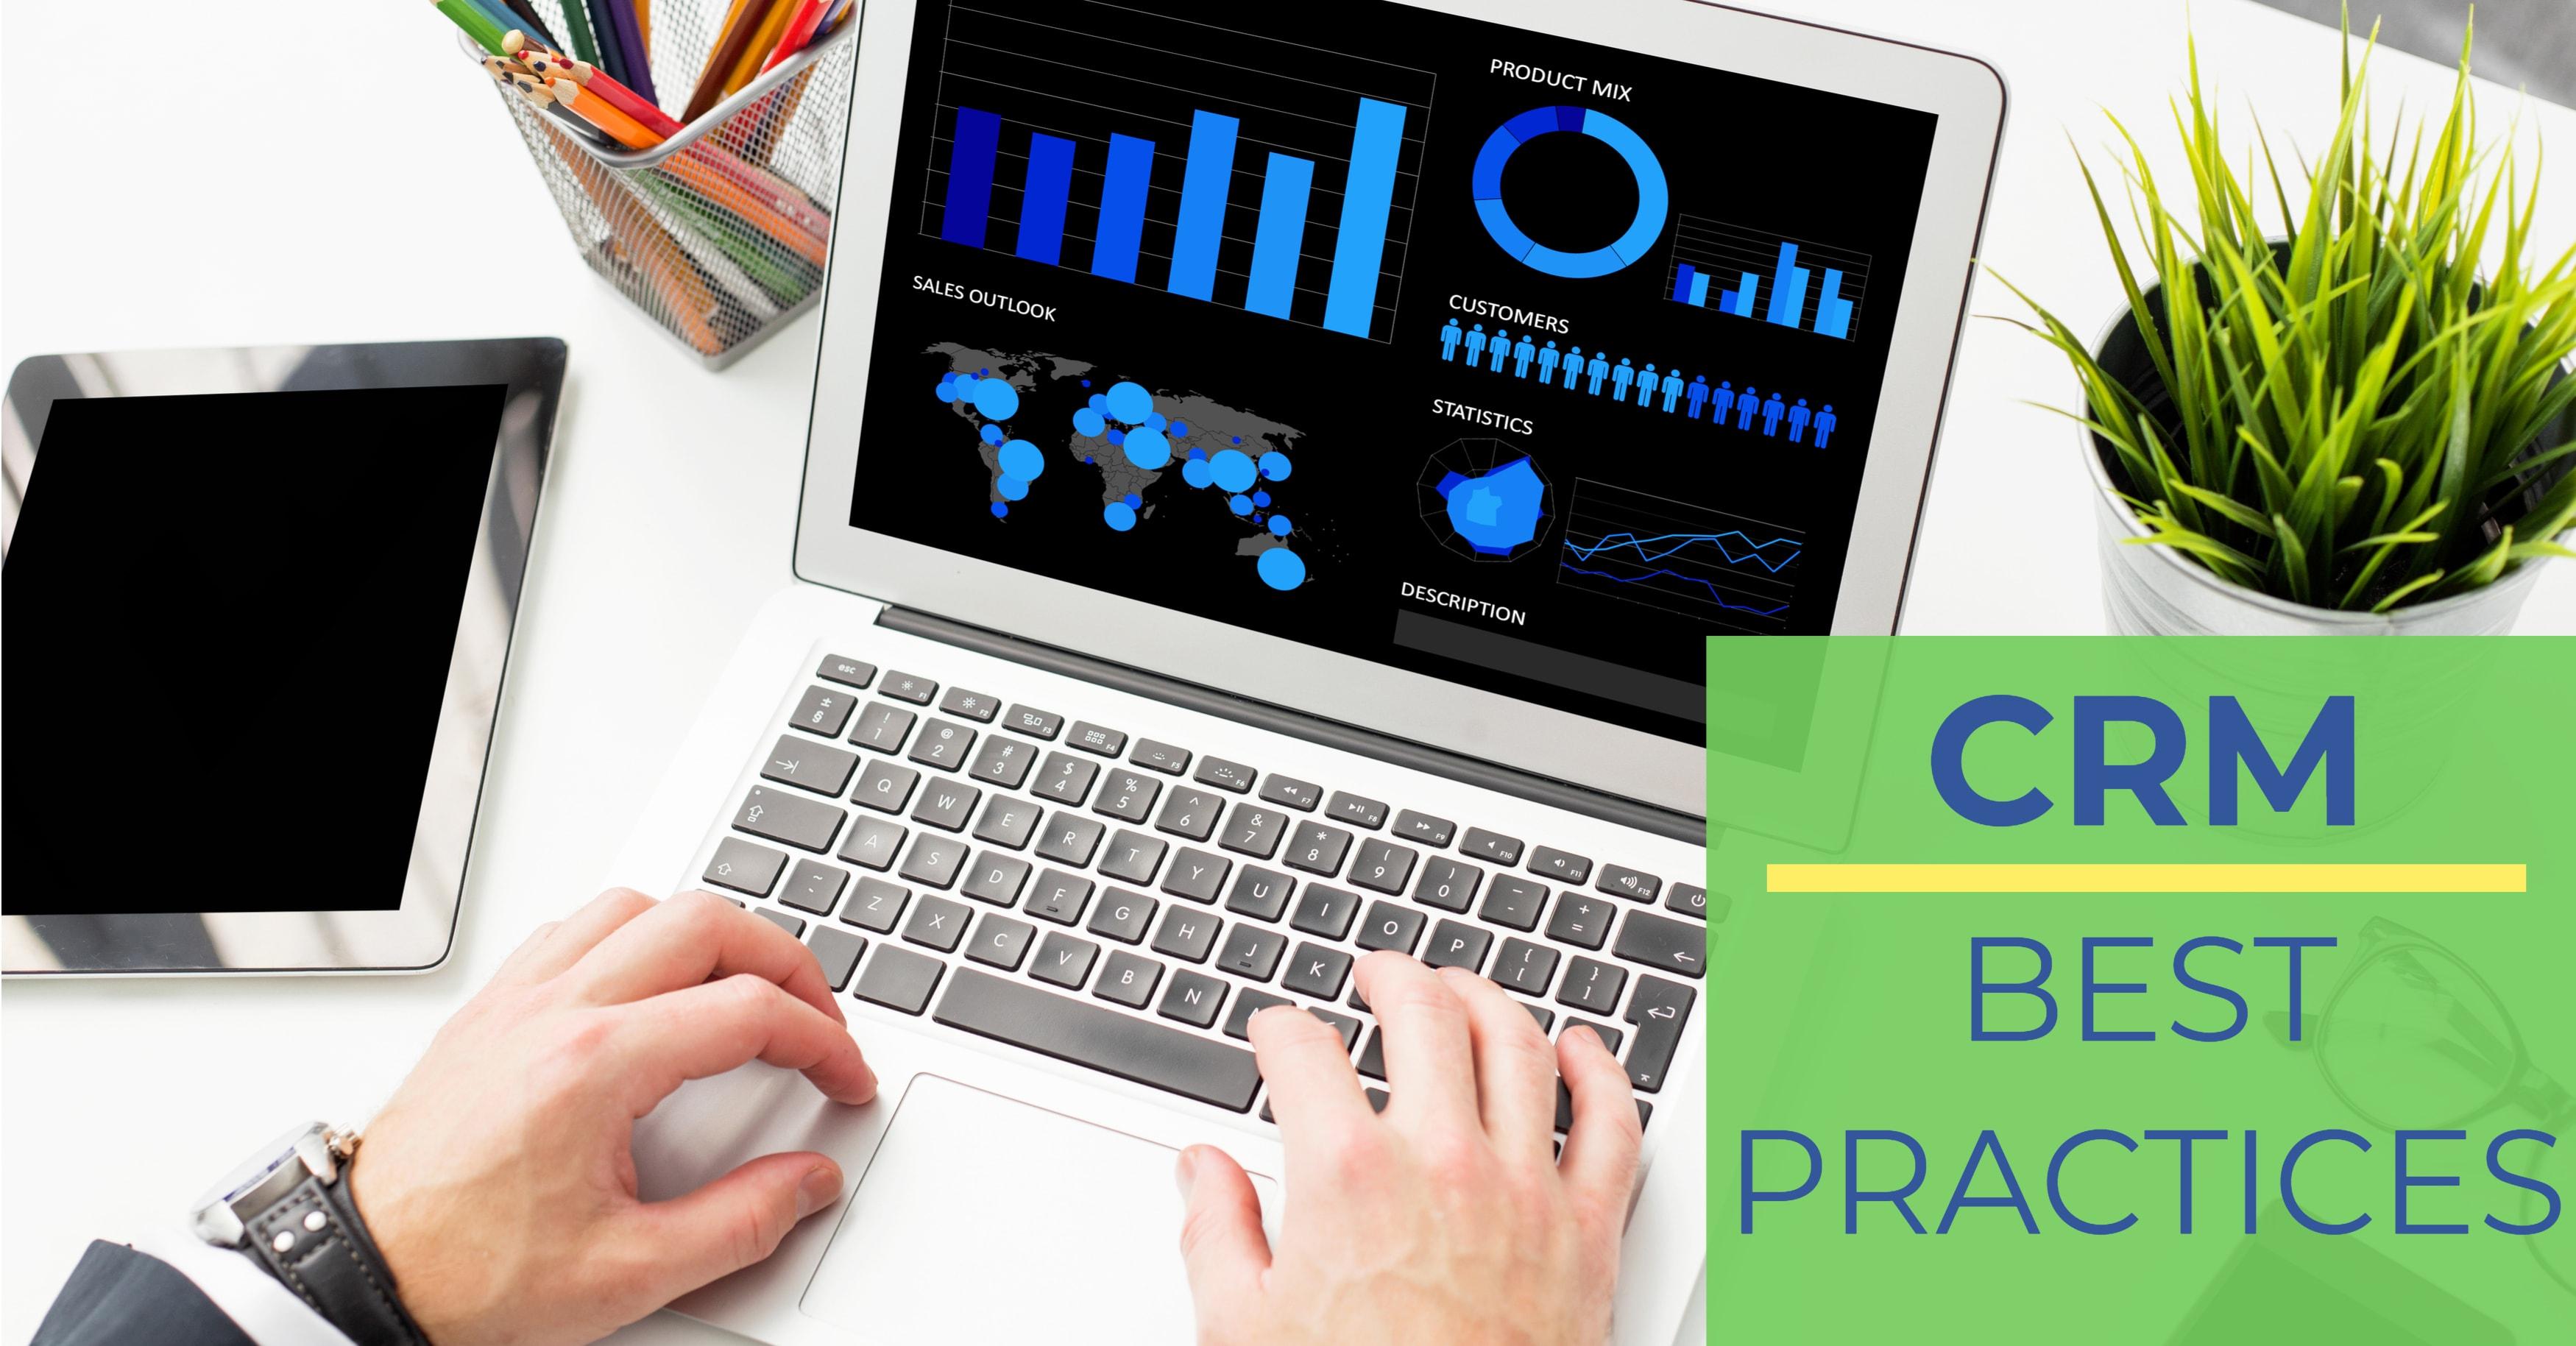 CRM Best Practices